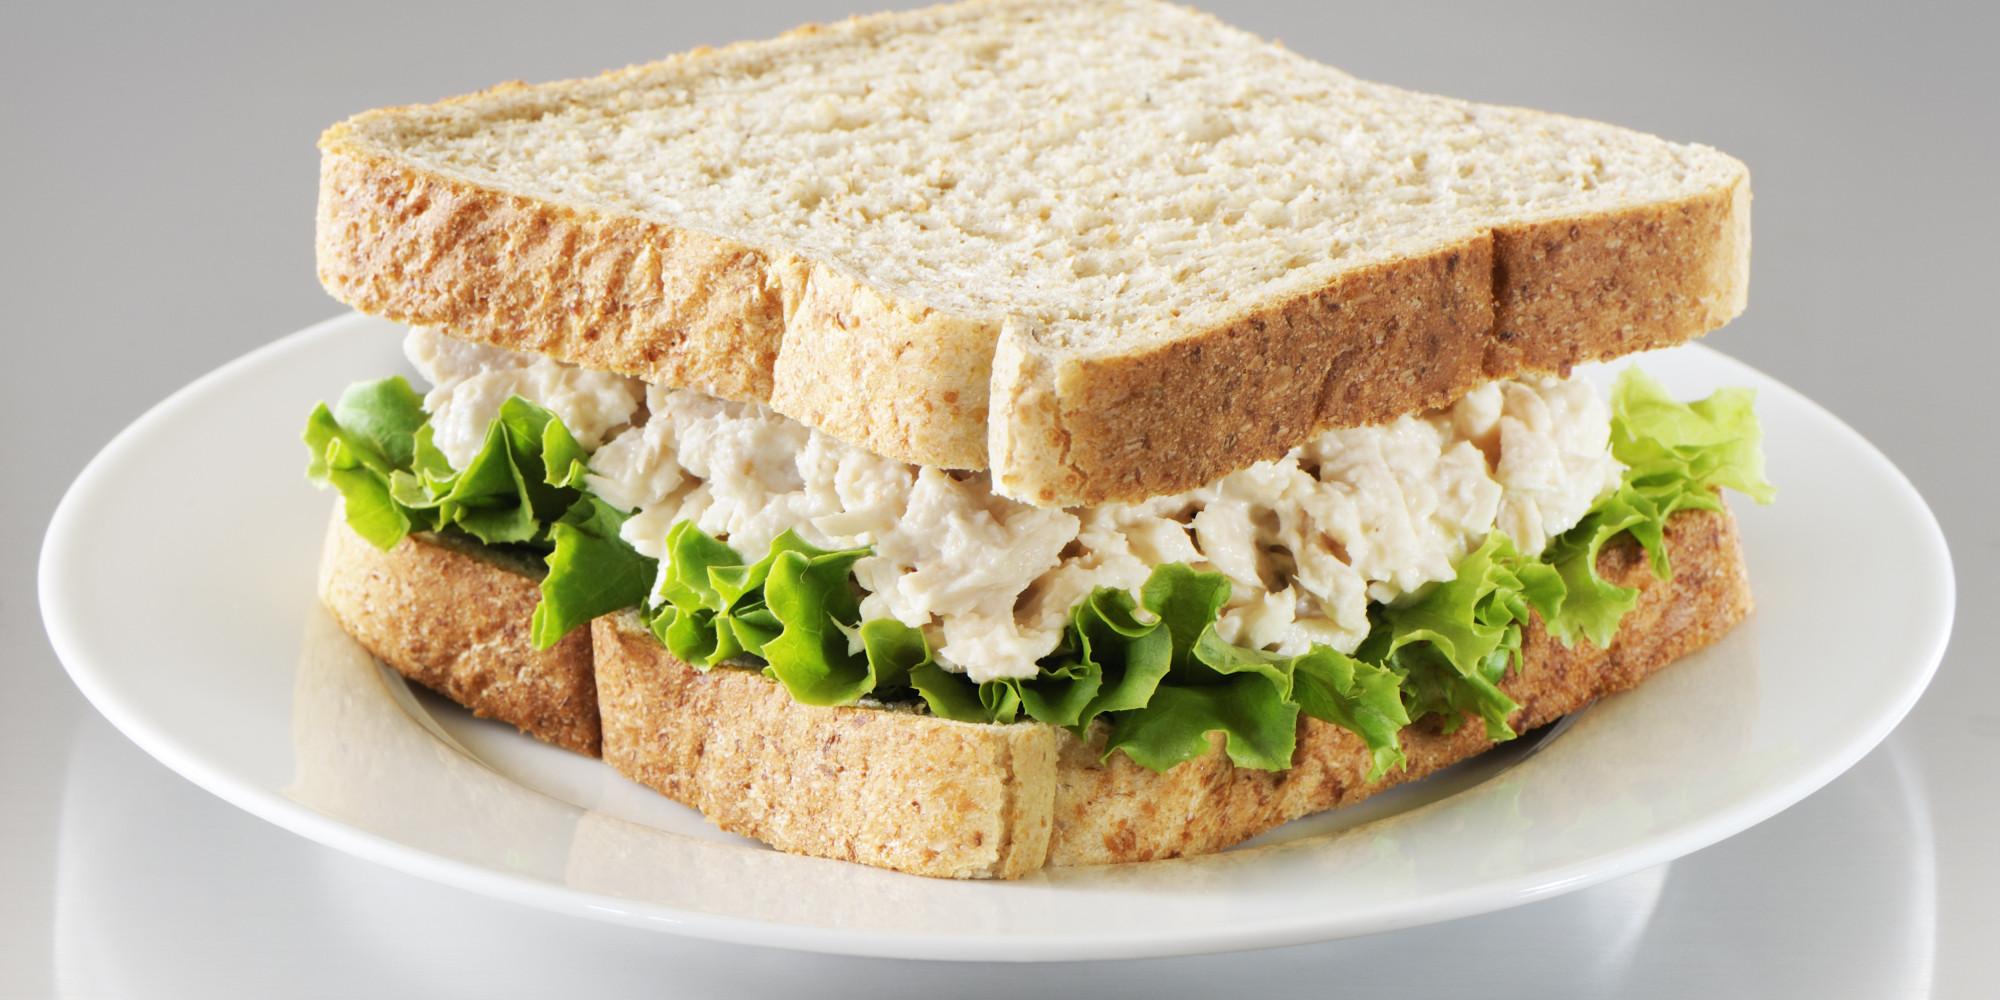 Free Tuna Sandwich Cliparts, Download Free Clip Art, Free.